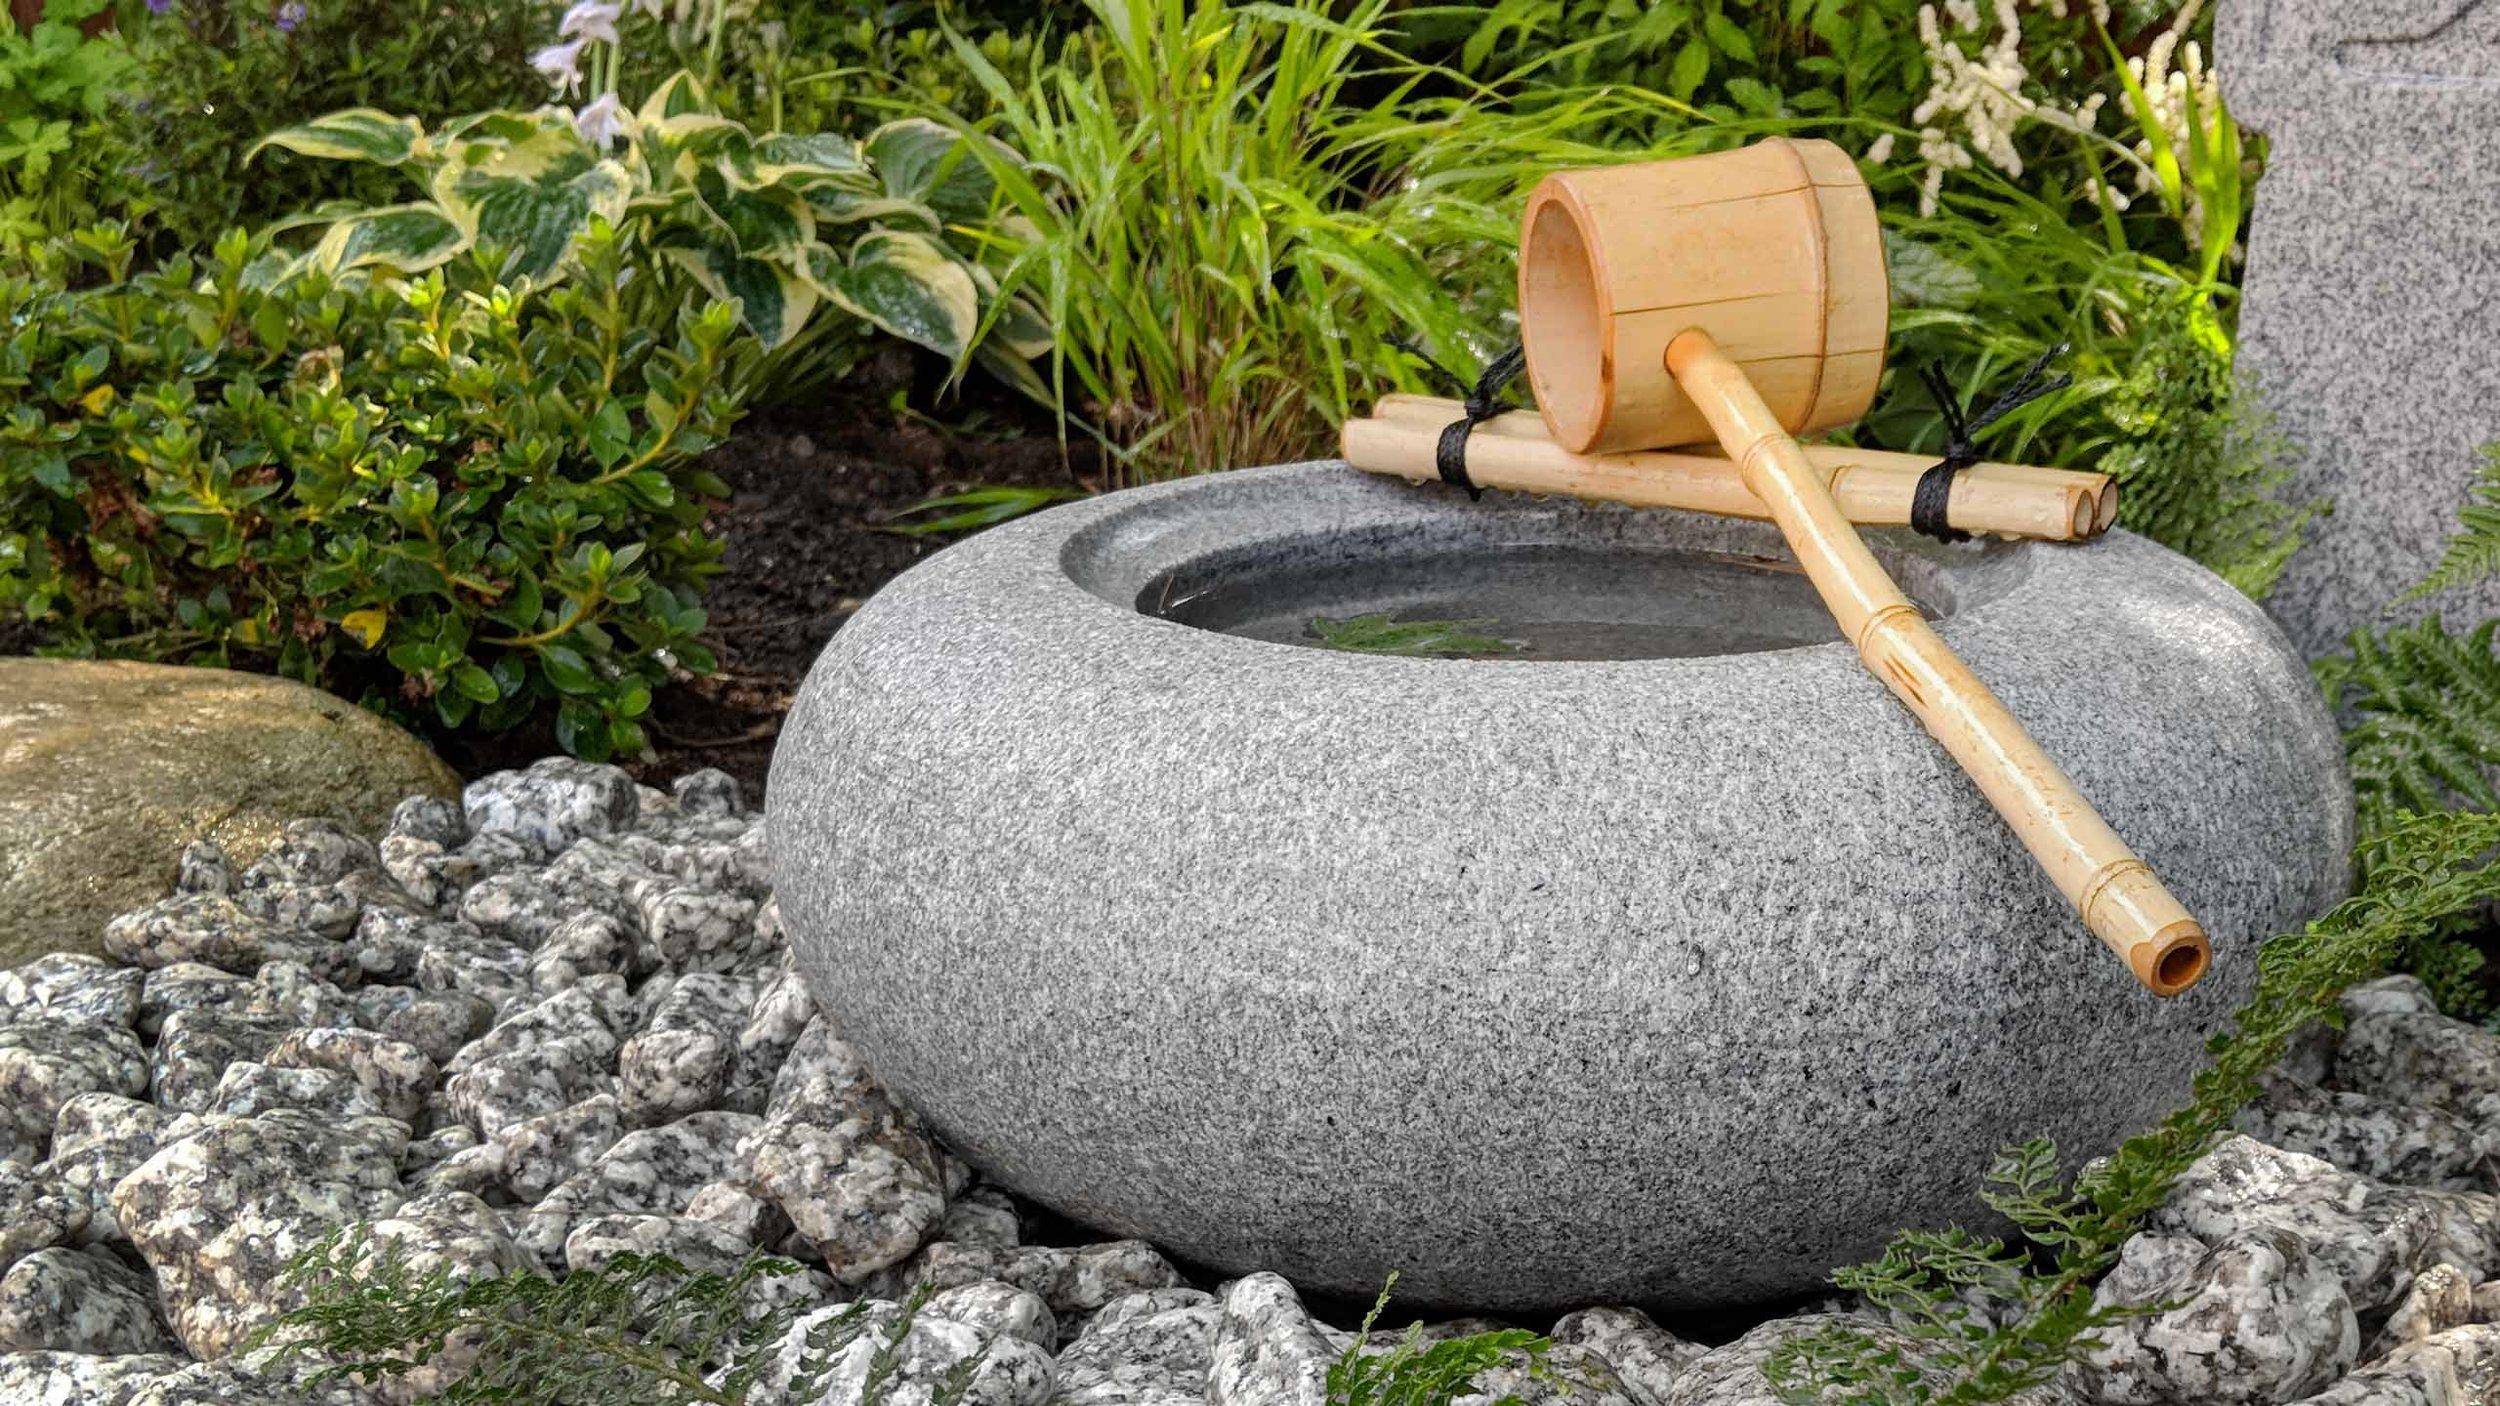 Cheshire Garden Design: Japanese garden with Tetsu Bachi Basin